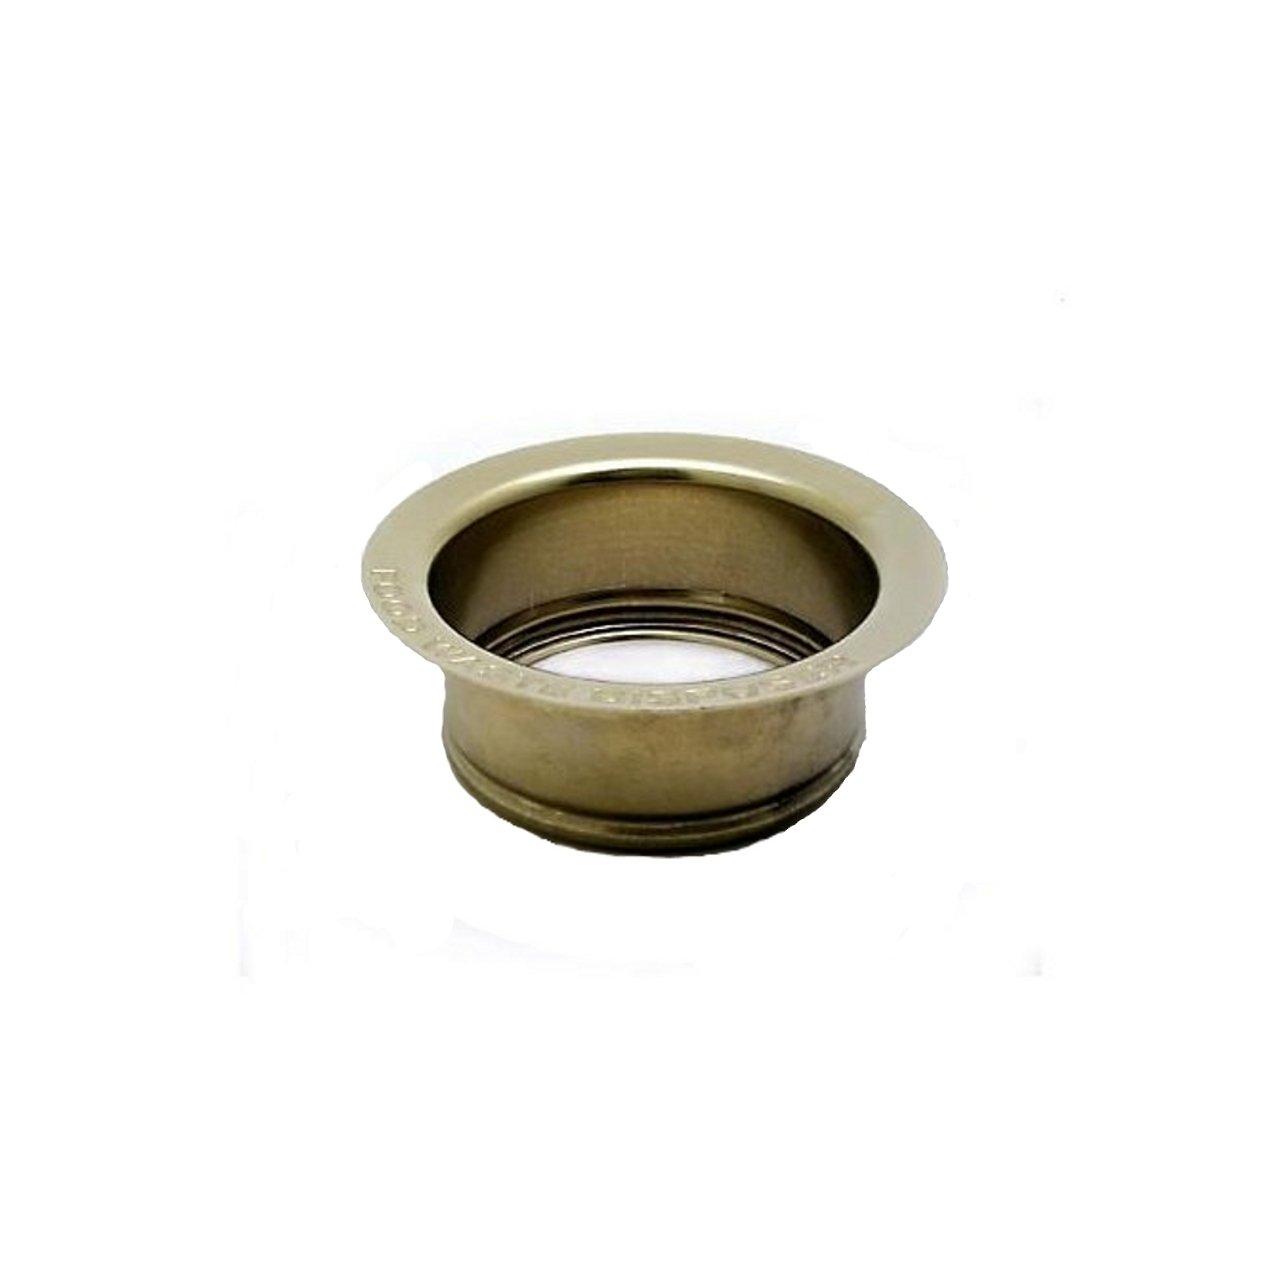 Viking SFLGBR Standard Disposer Sink Flange, Brass